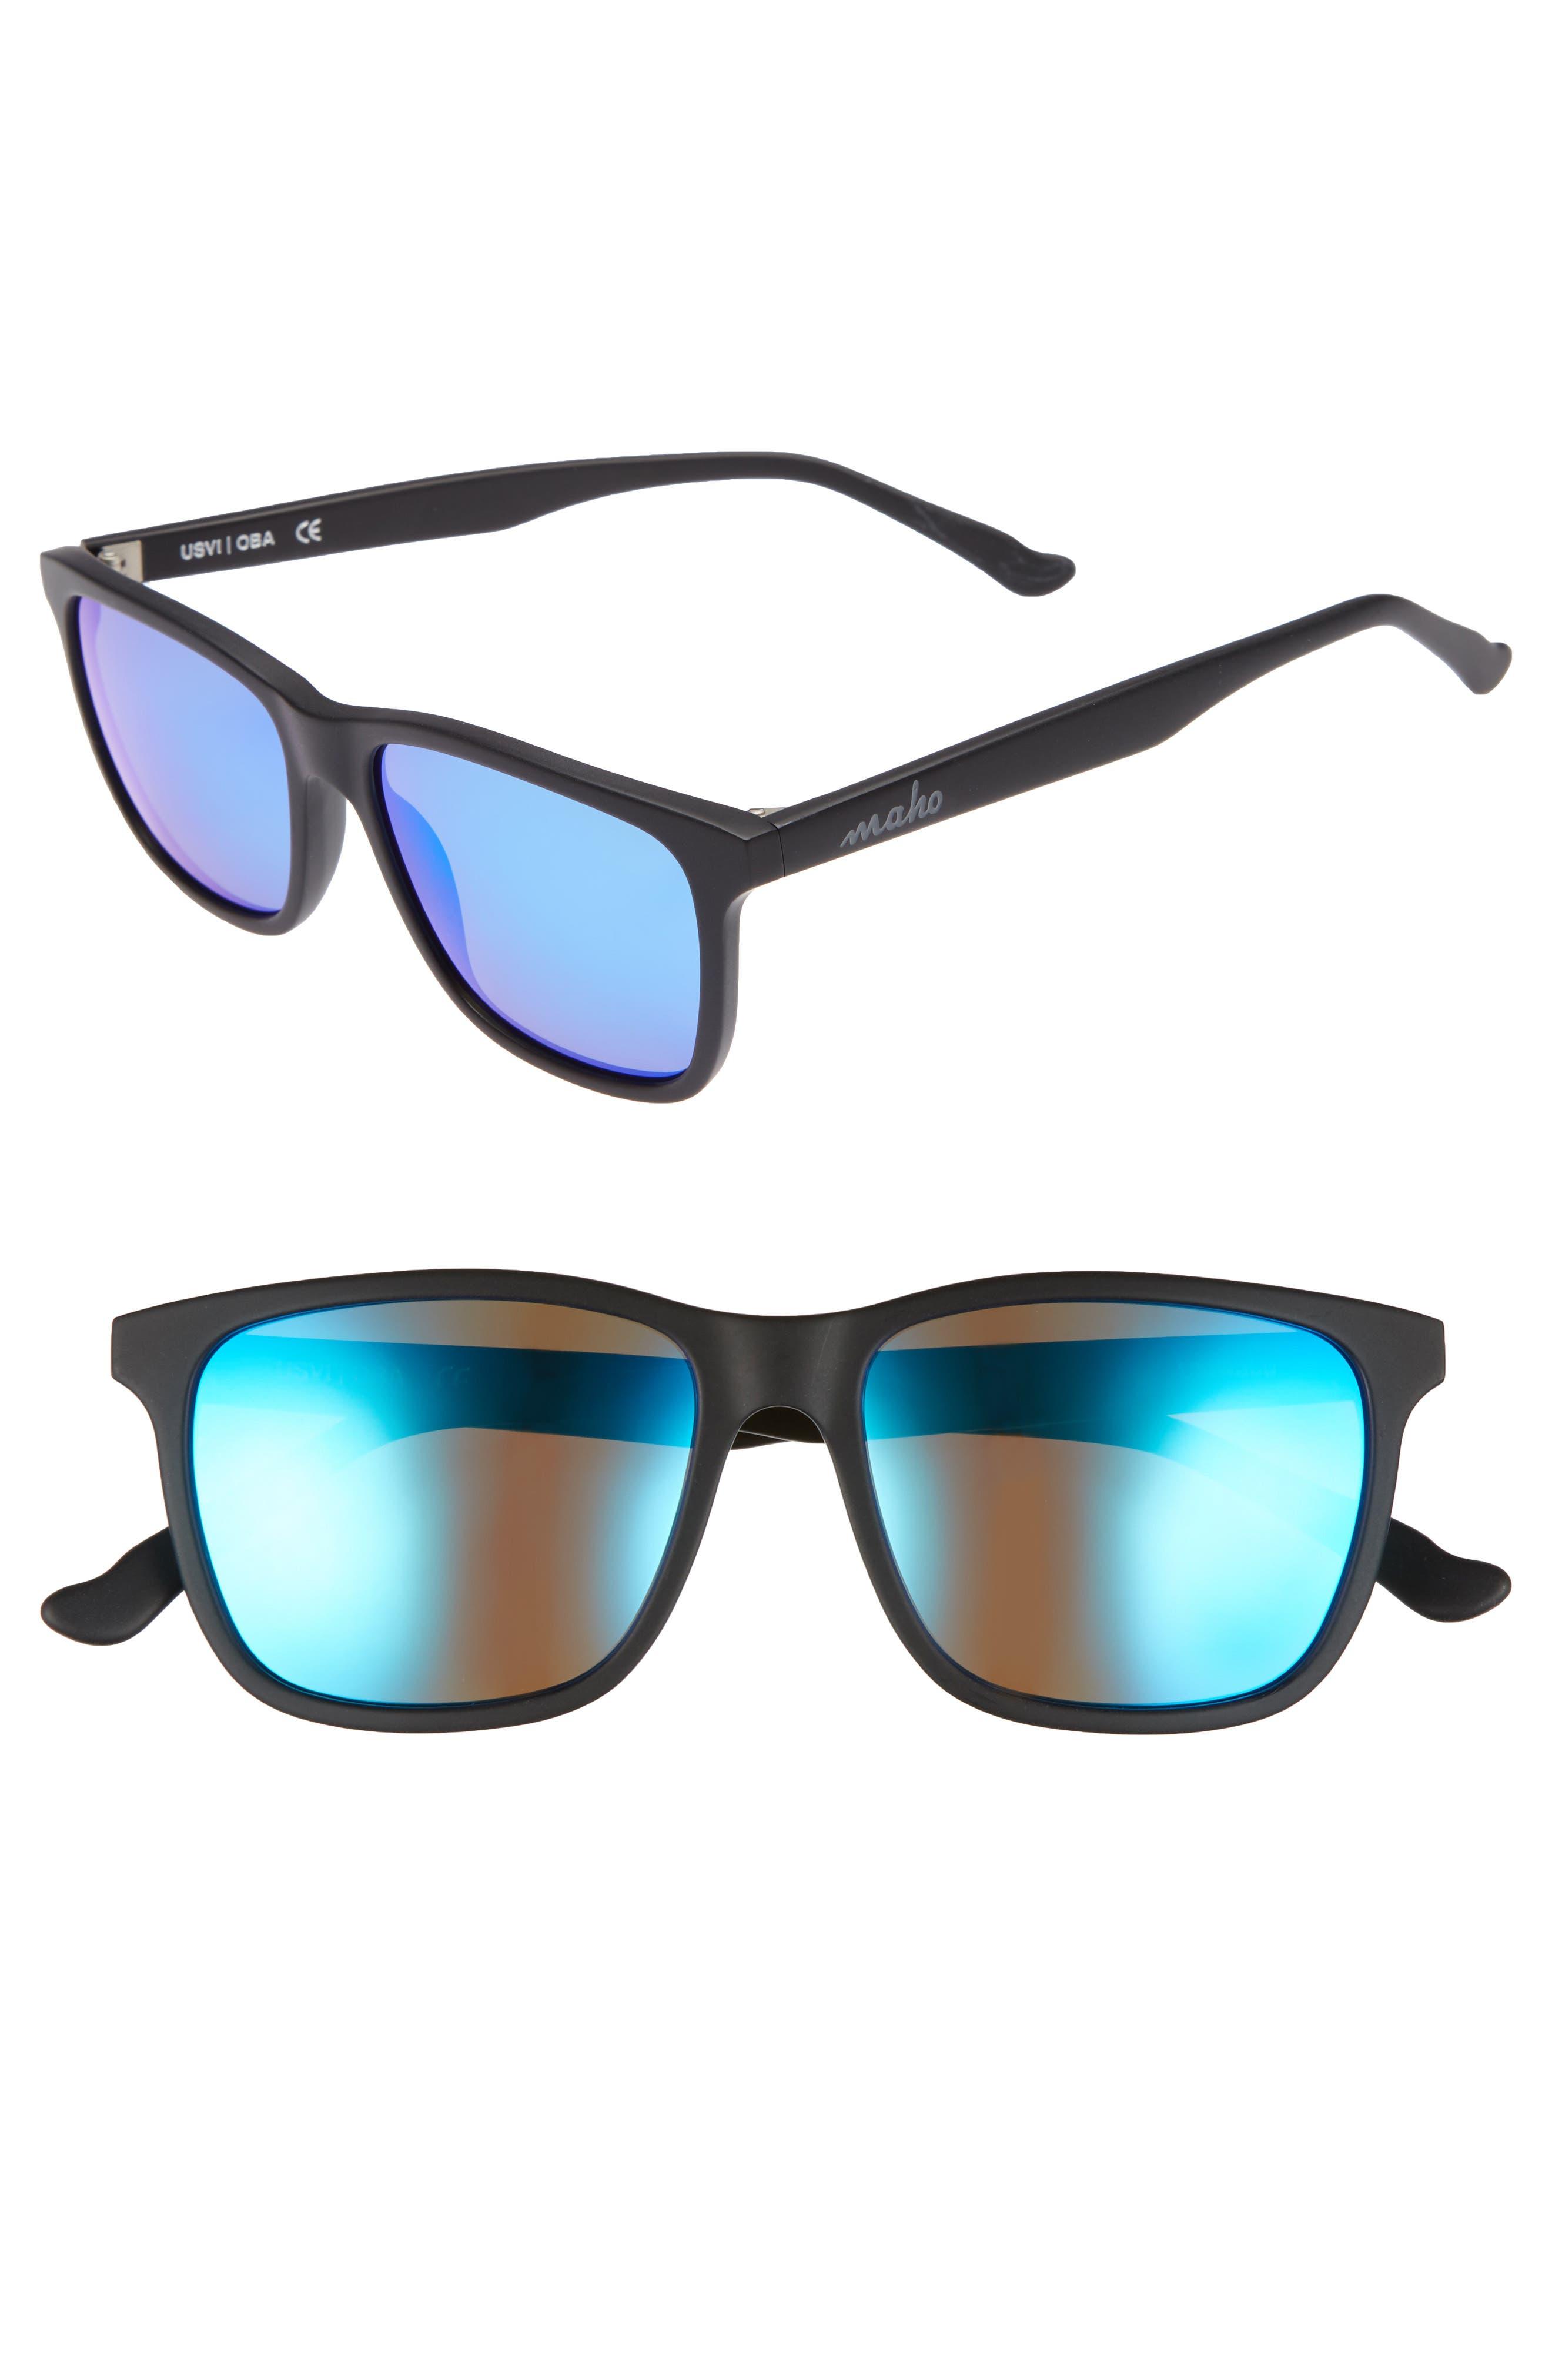 Uluwatu 52mm Polarized Sunglasses,                             Main thumbnail 1, color,                             Charcoal